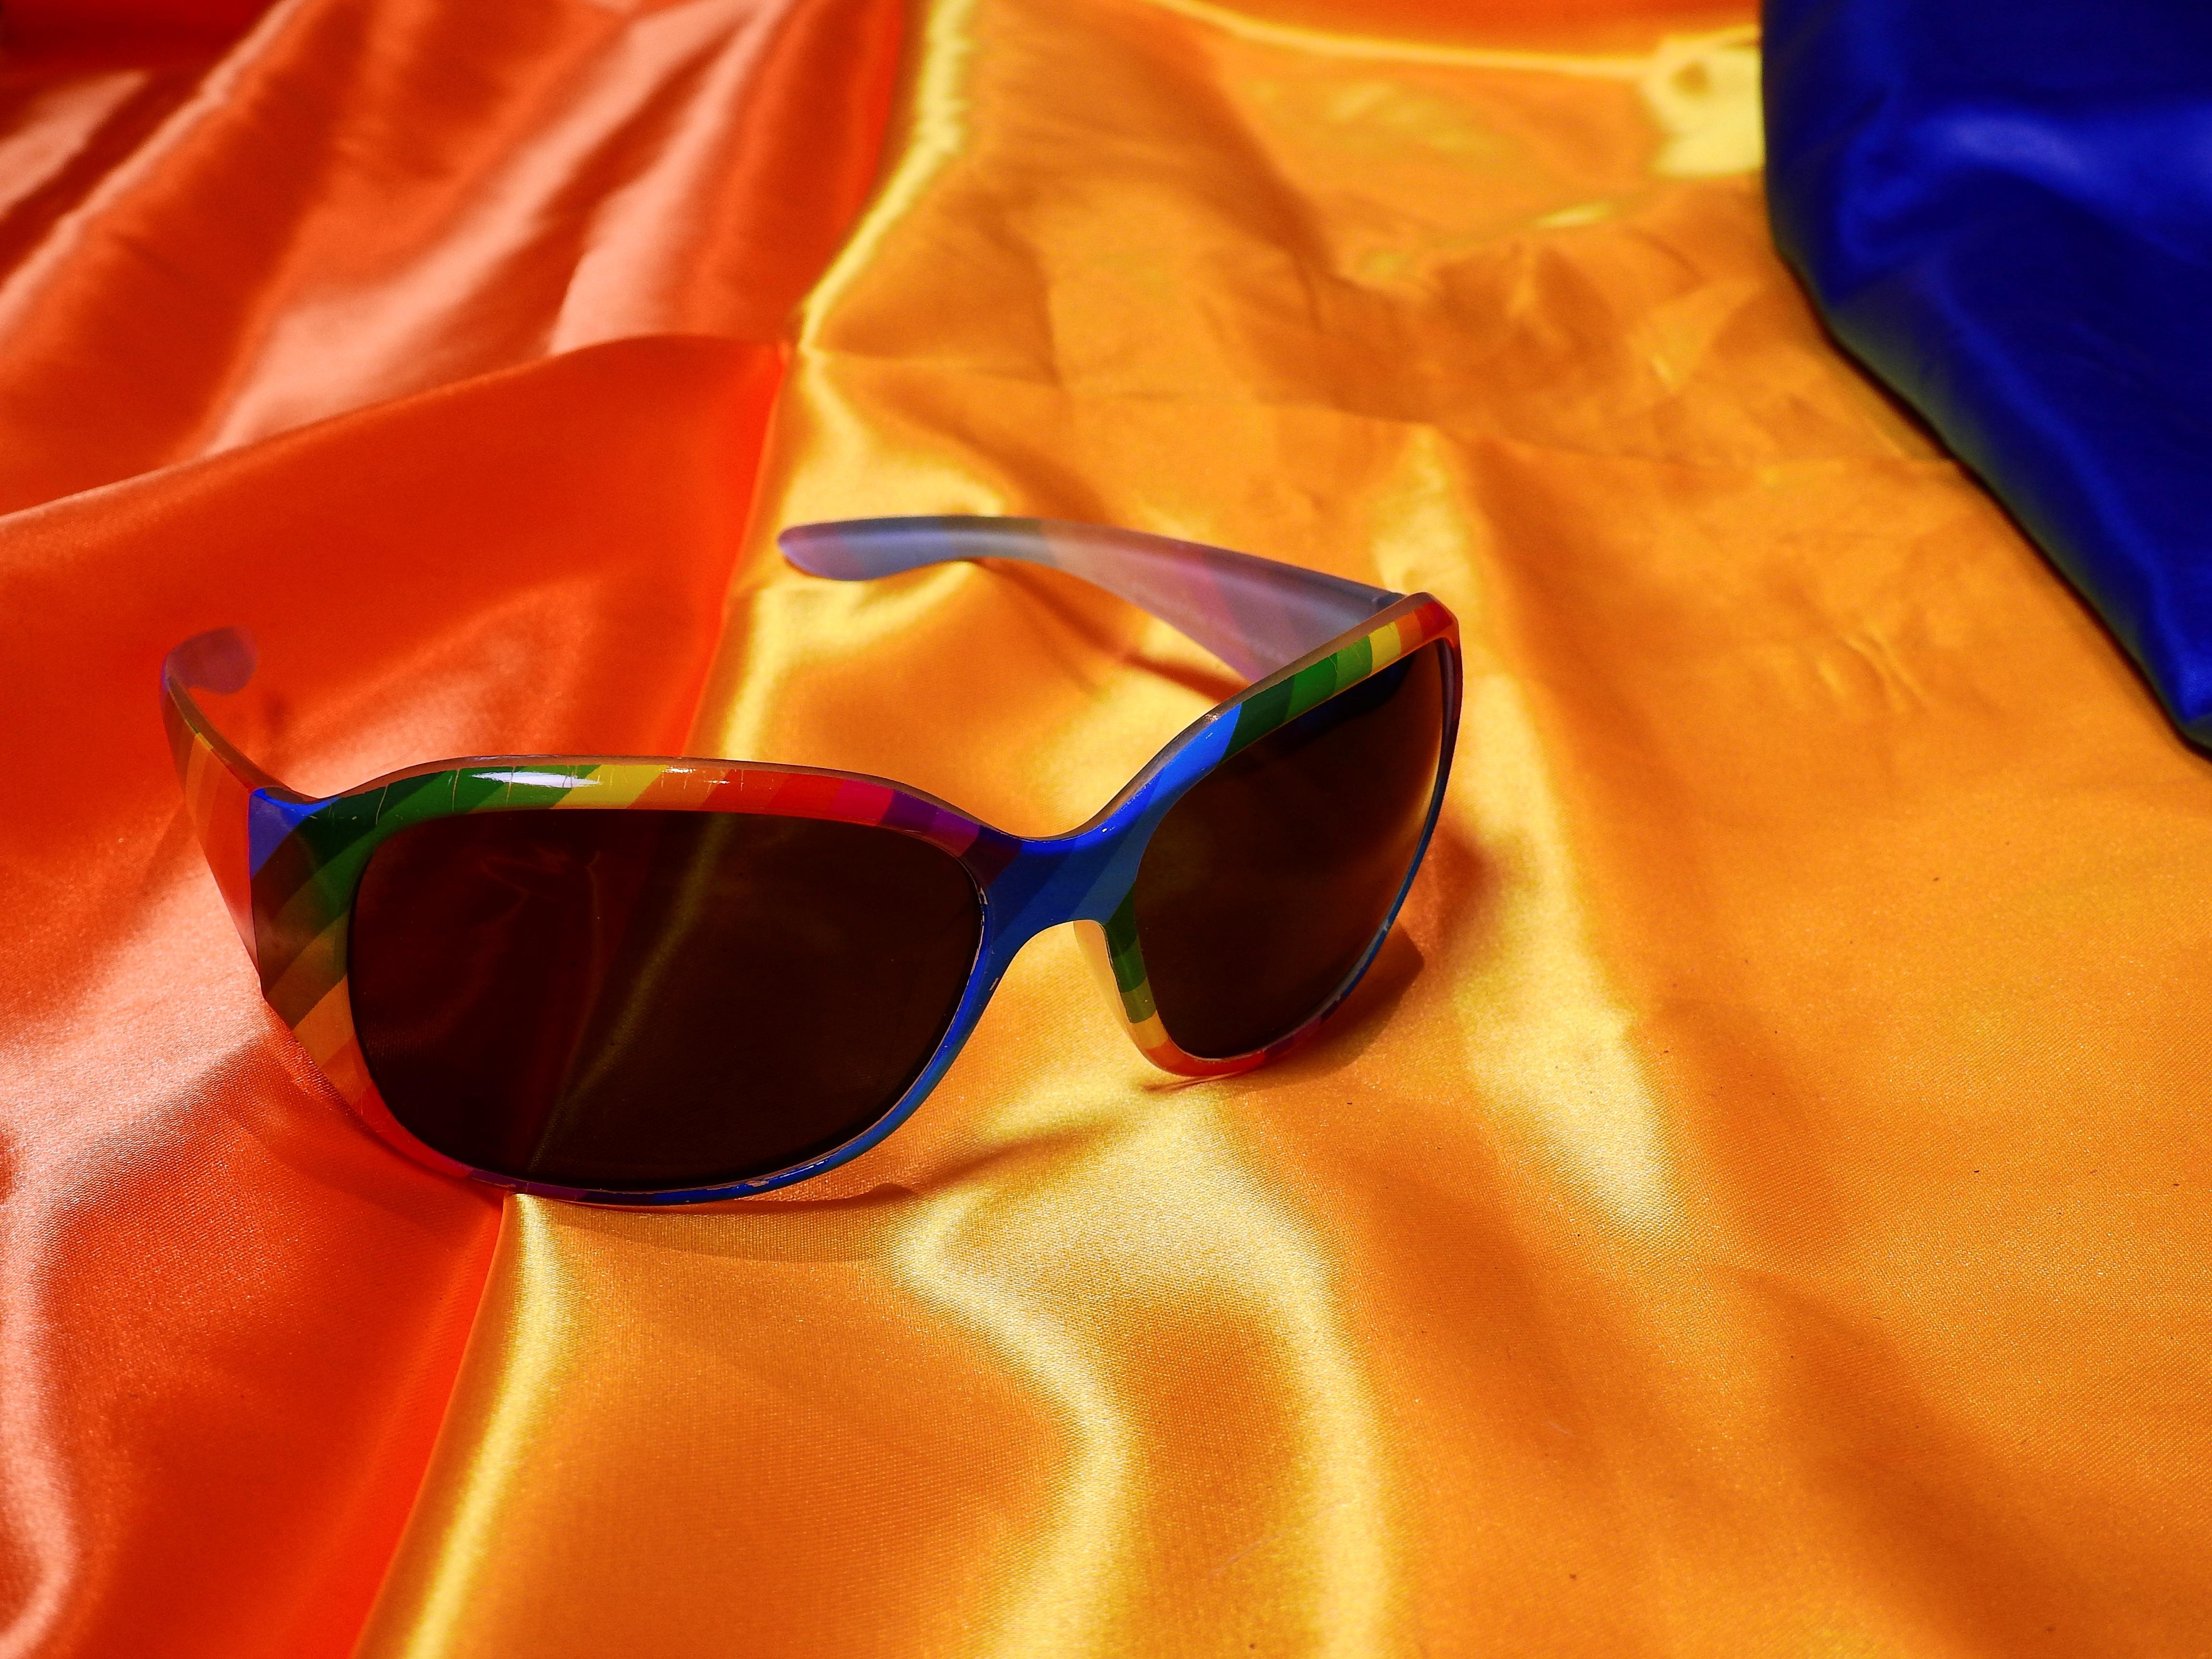 Kostenlose foto : Orange, rot, Karneval, bunt, Gelb, Stoff, Maske ...